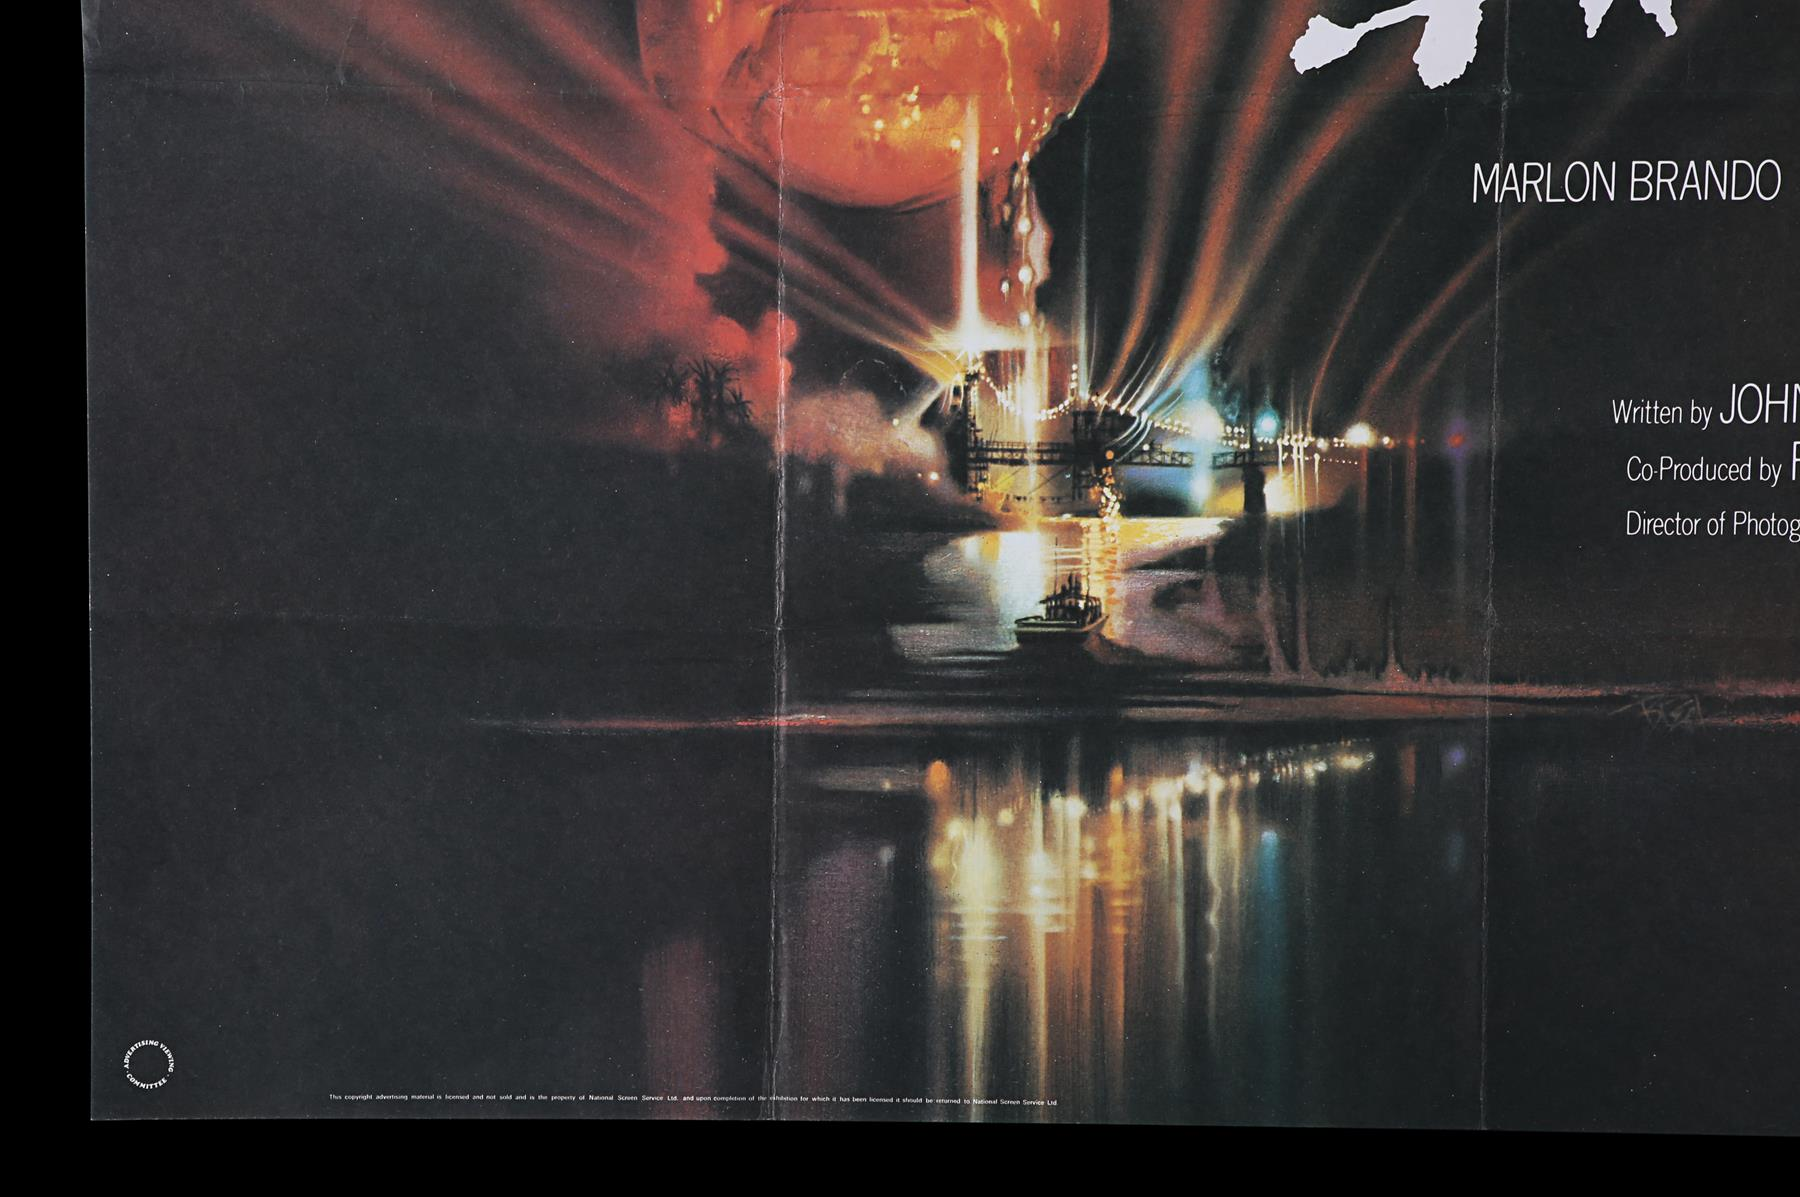 APOCALYPSE NOW (1979) - UK Quad, 1979 - Image 5 of 7